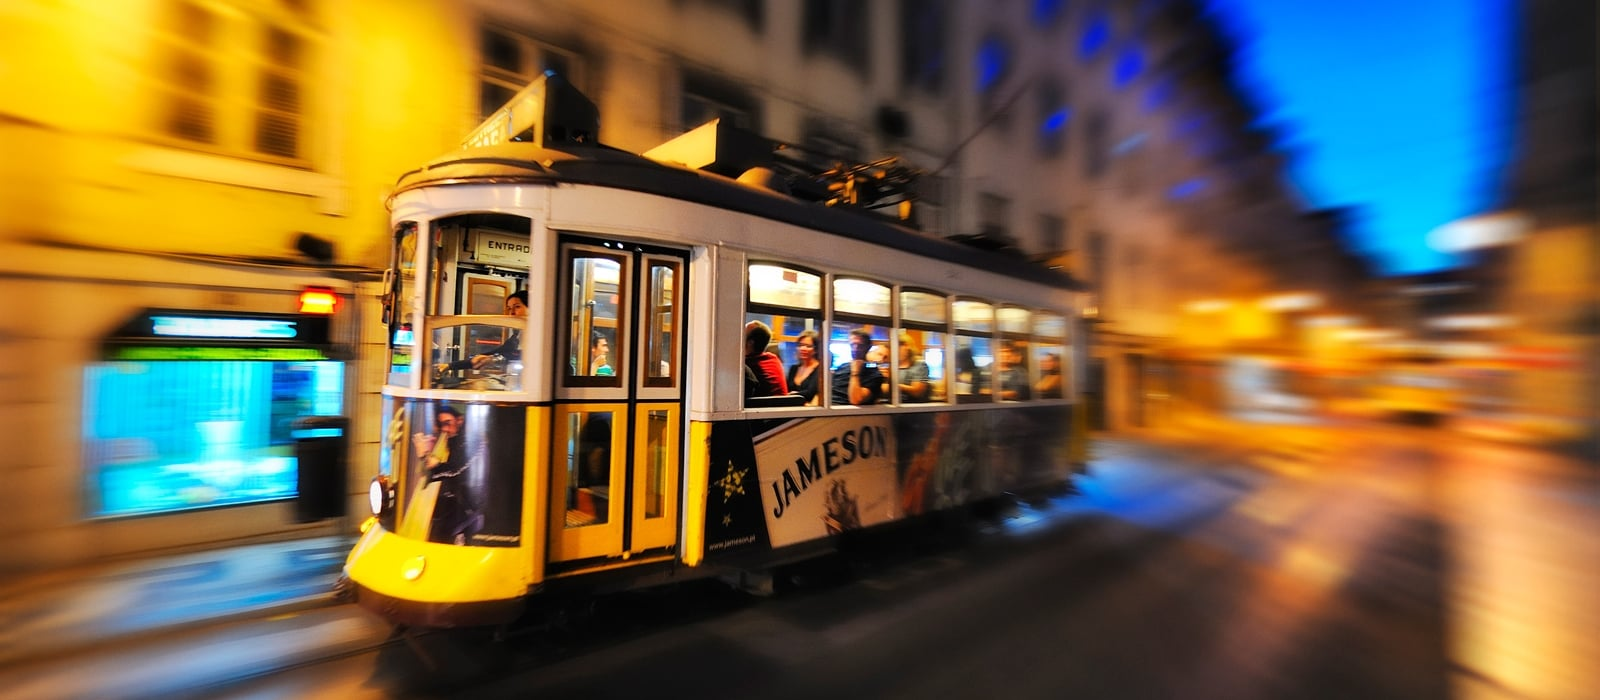 Hotels in Lissabon - Vincci Hoteles